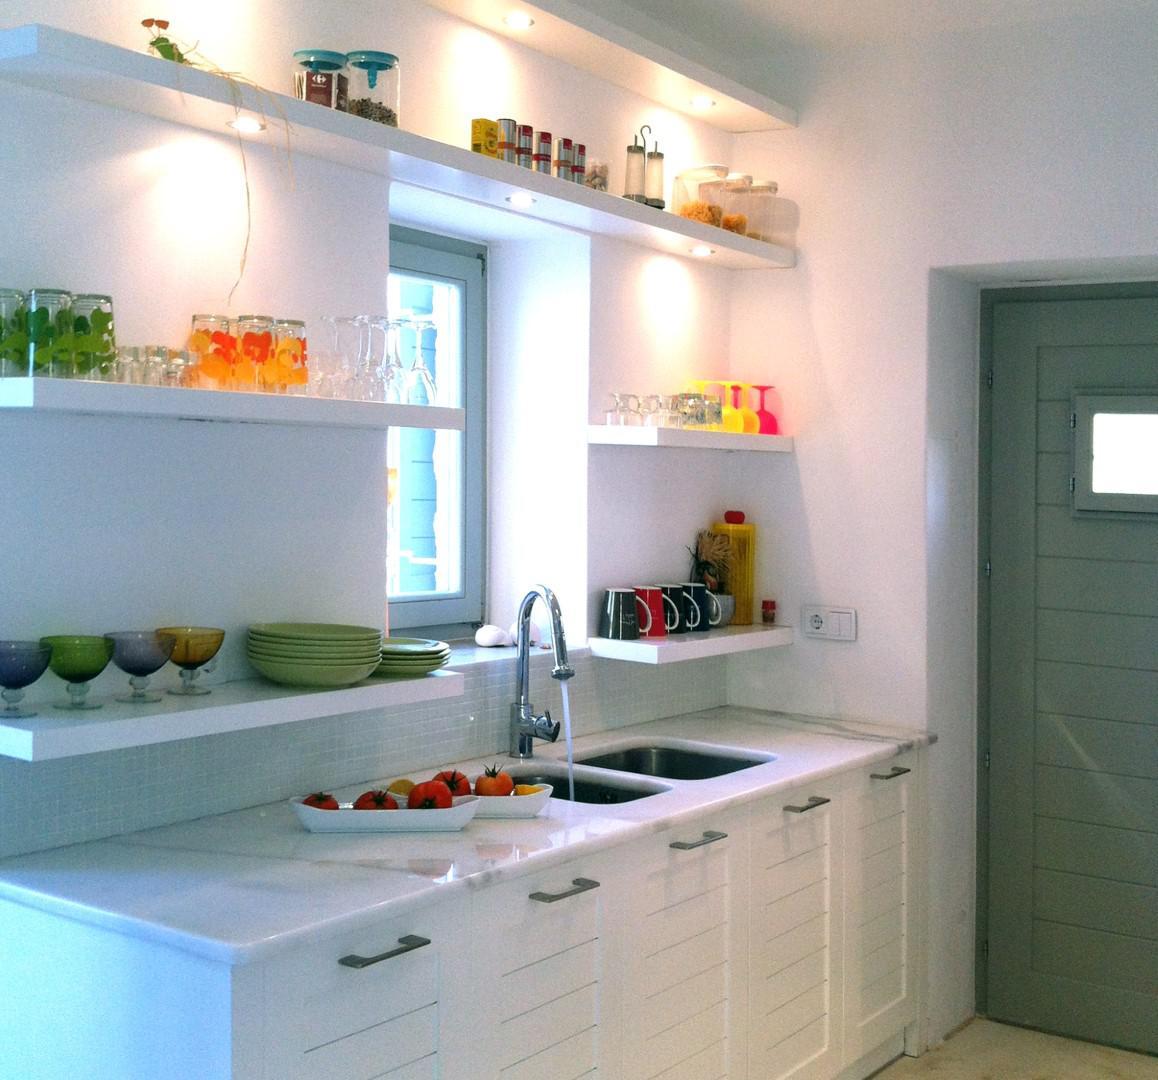 houses-kitchen.jpg